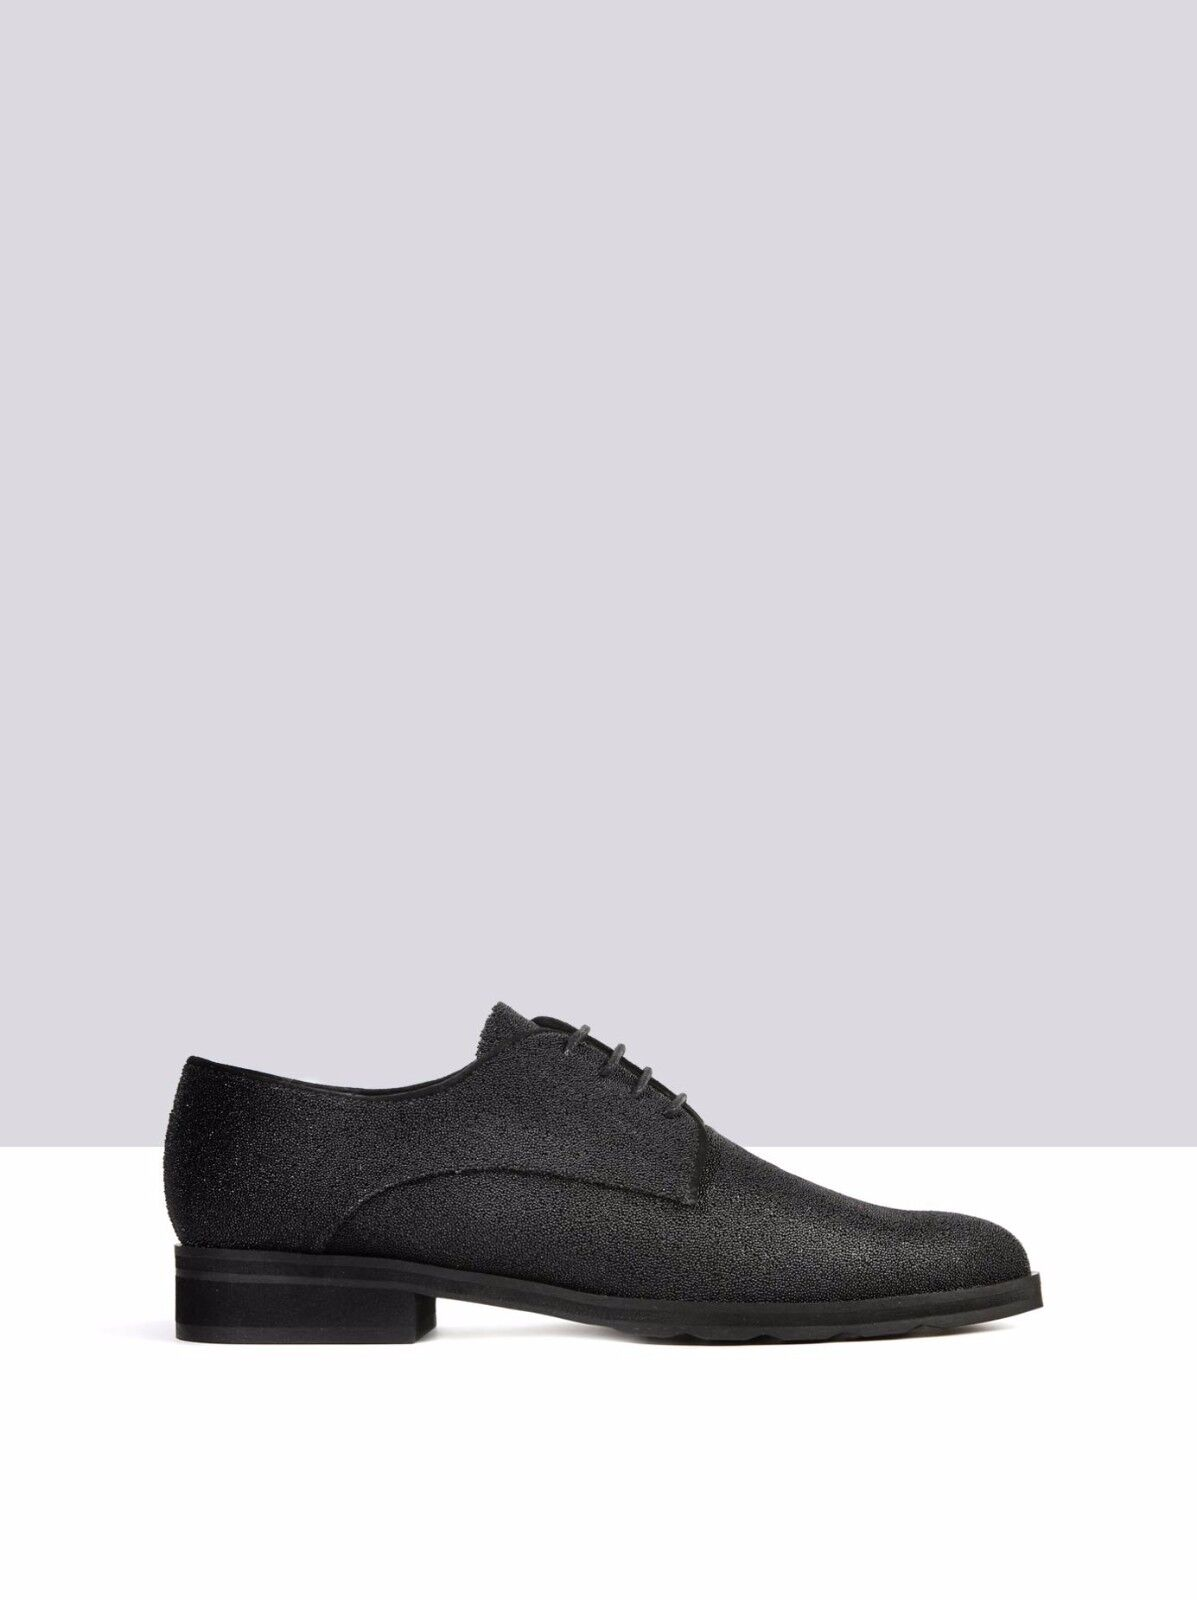 Ted & Muffy Jive Black Lace Up shoes UK 7 EU 40 JS24 69 SALEx